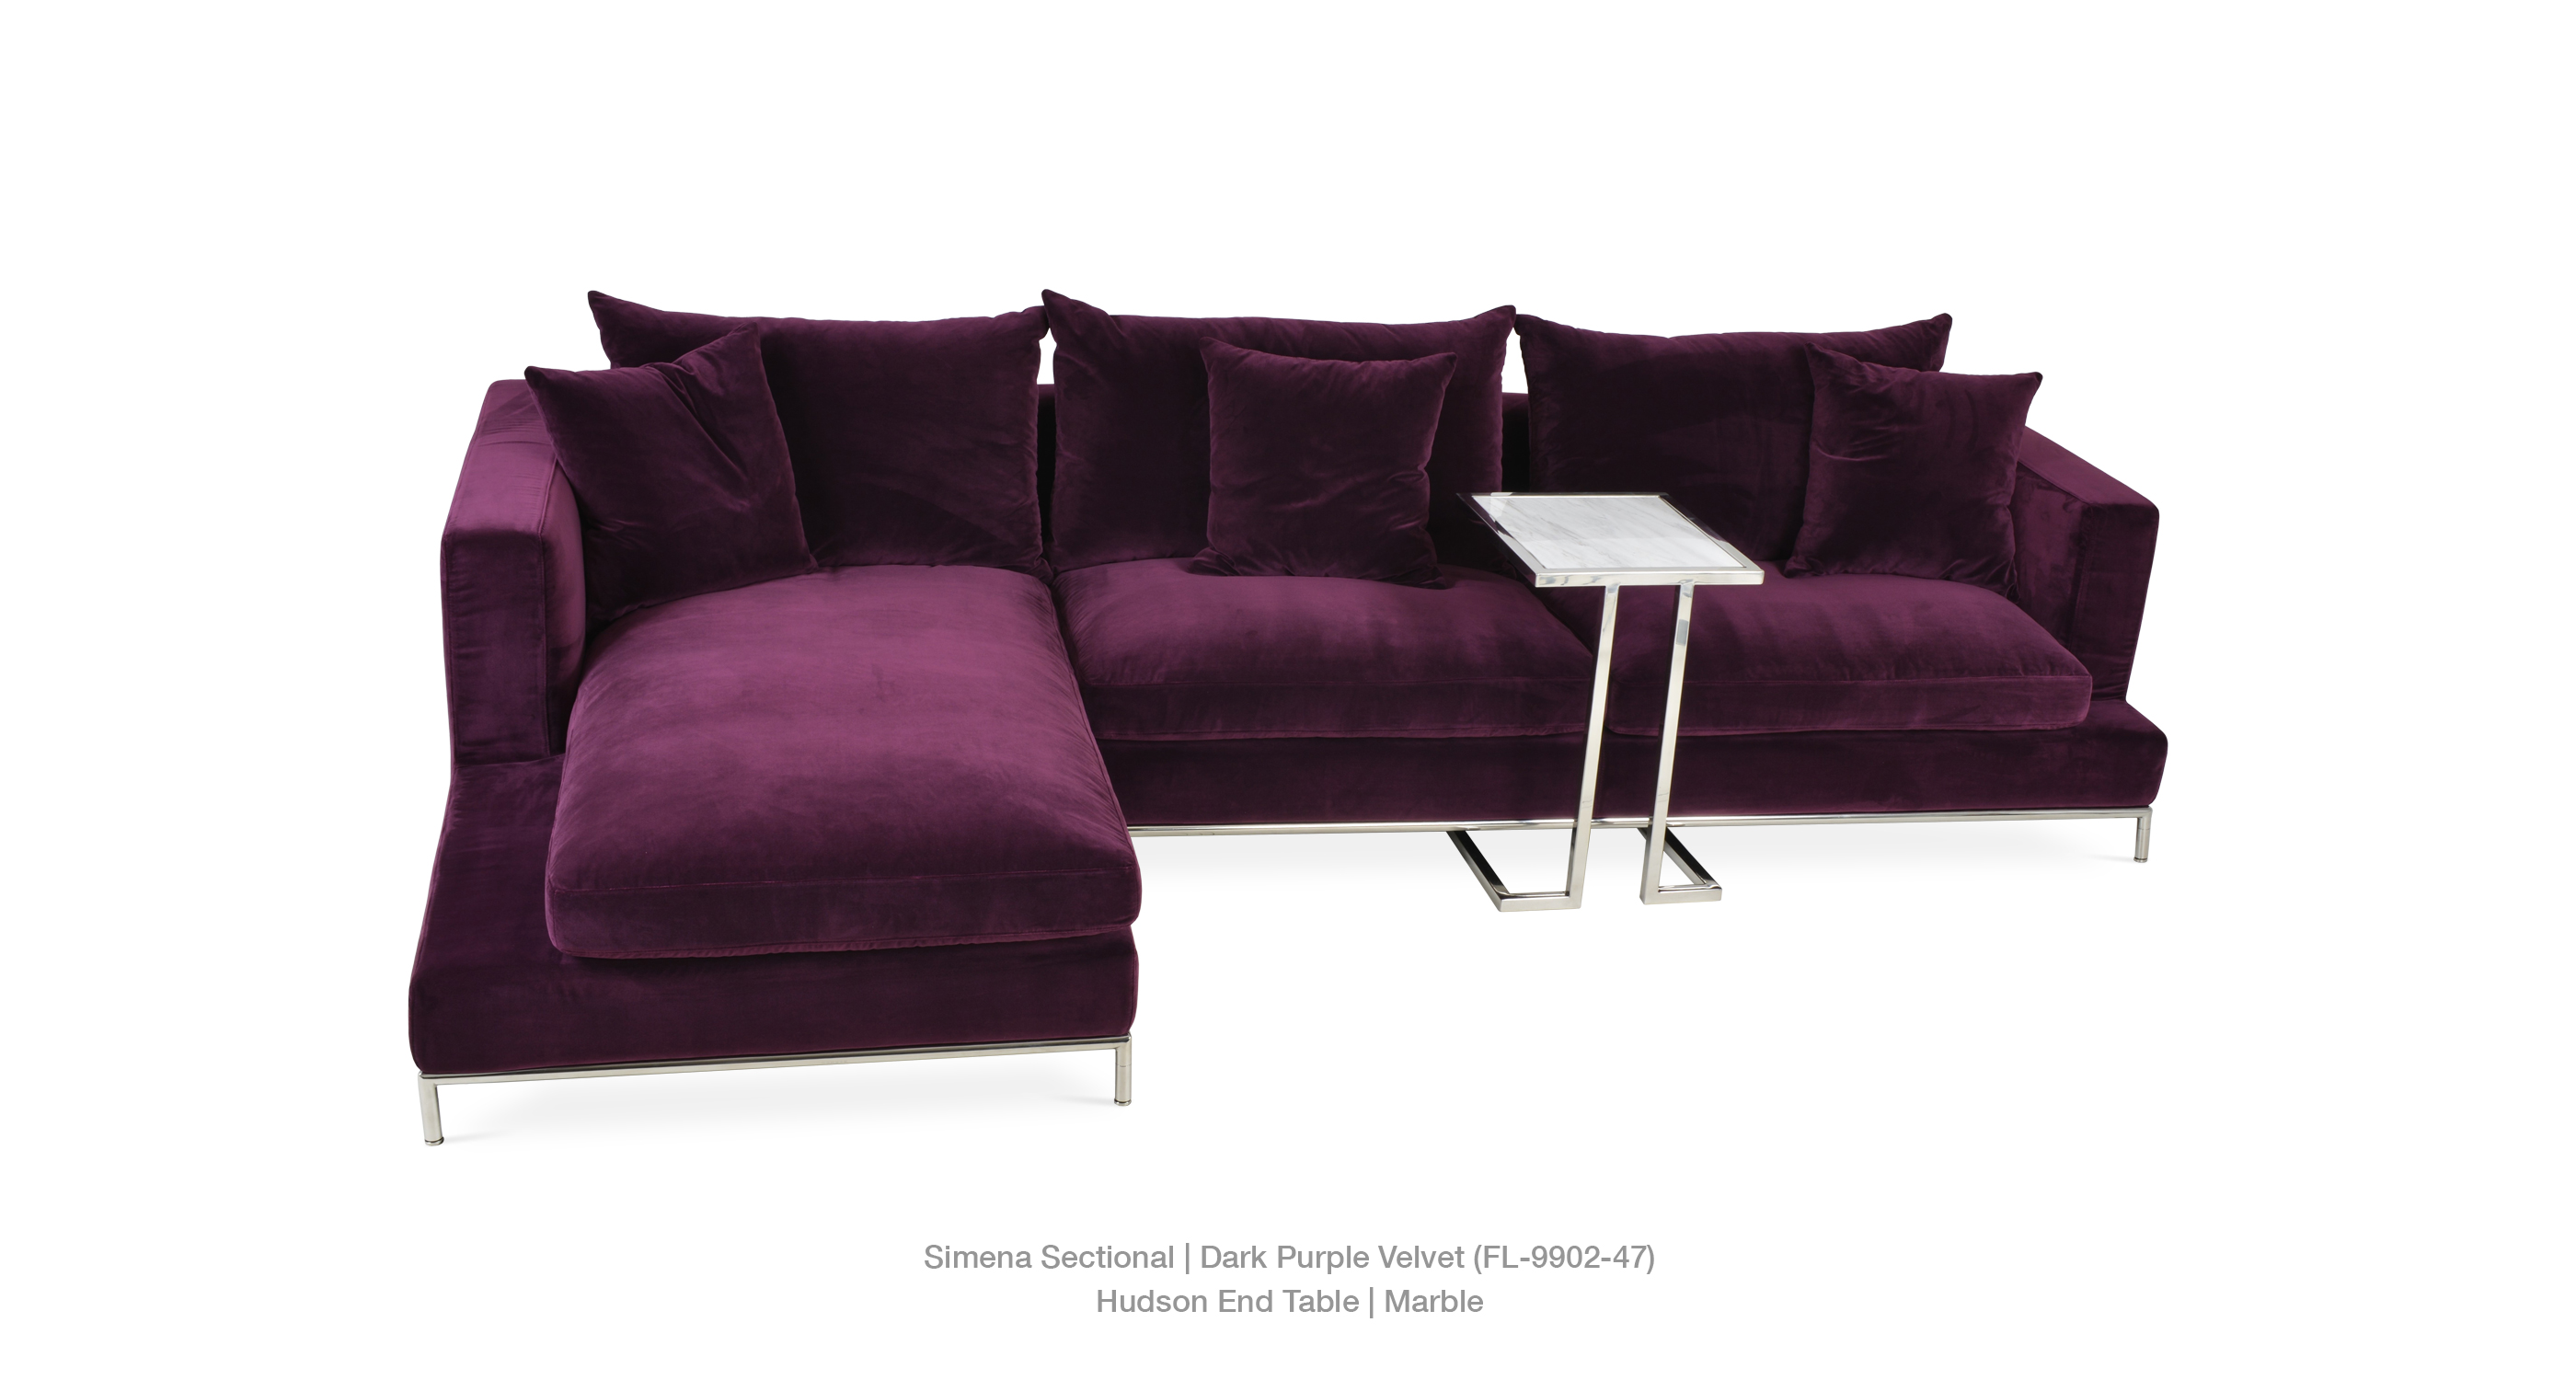 Outstanding Simena Contemporary Sectional Sofas Sohoconcept Ncnpc Chair Design For Home Ncnpcorg